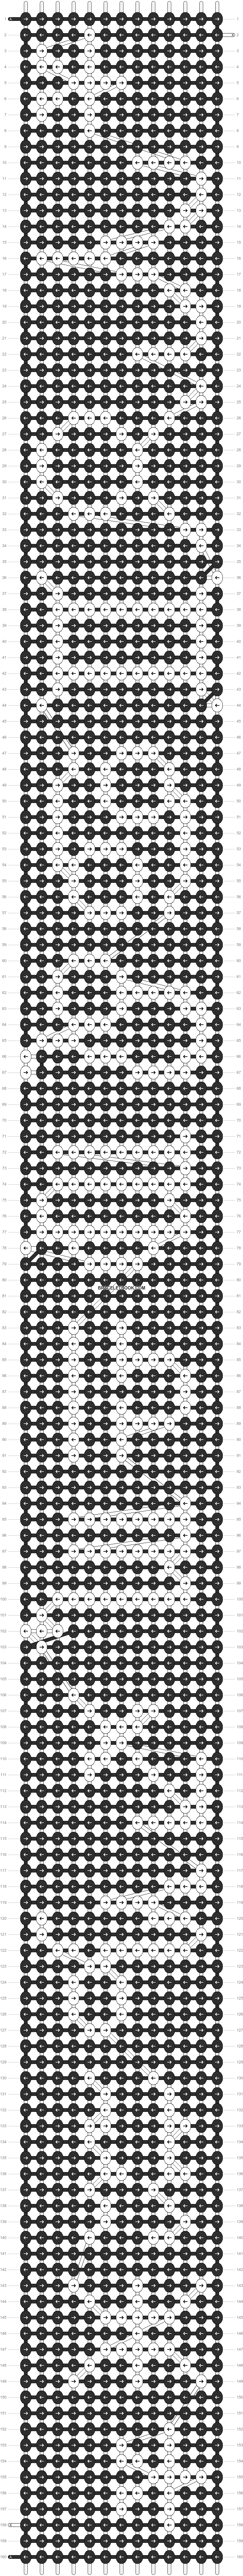 Alpha pattern #2127 pattern